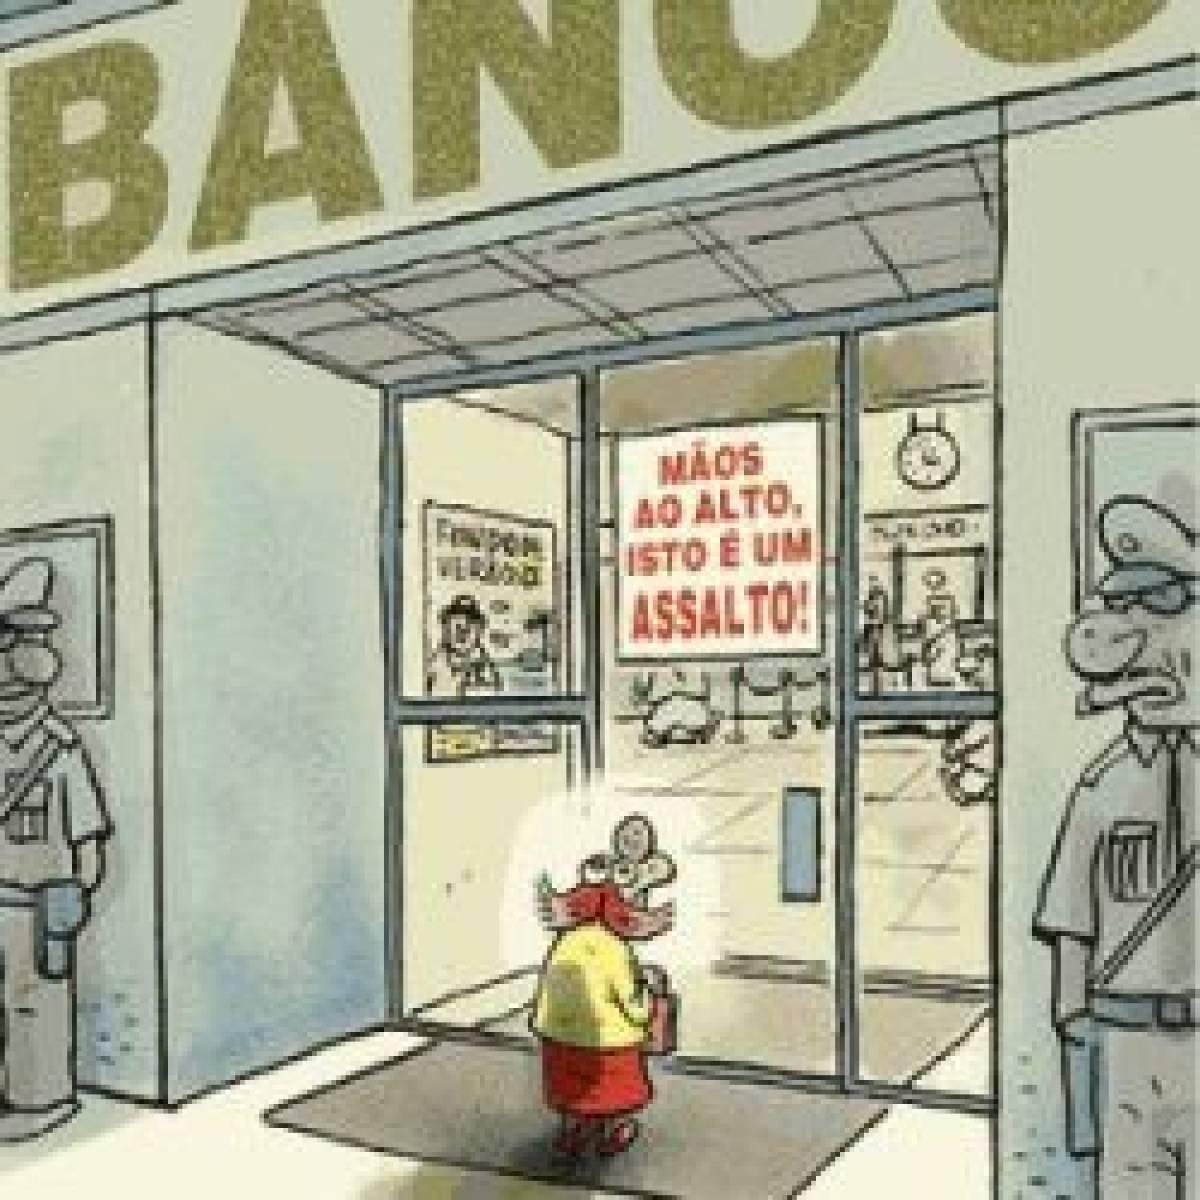 Queixas contra bancos crescem 69% no 1º bimestre de 2011